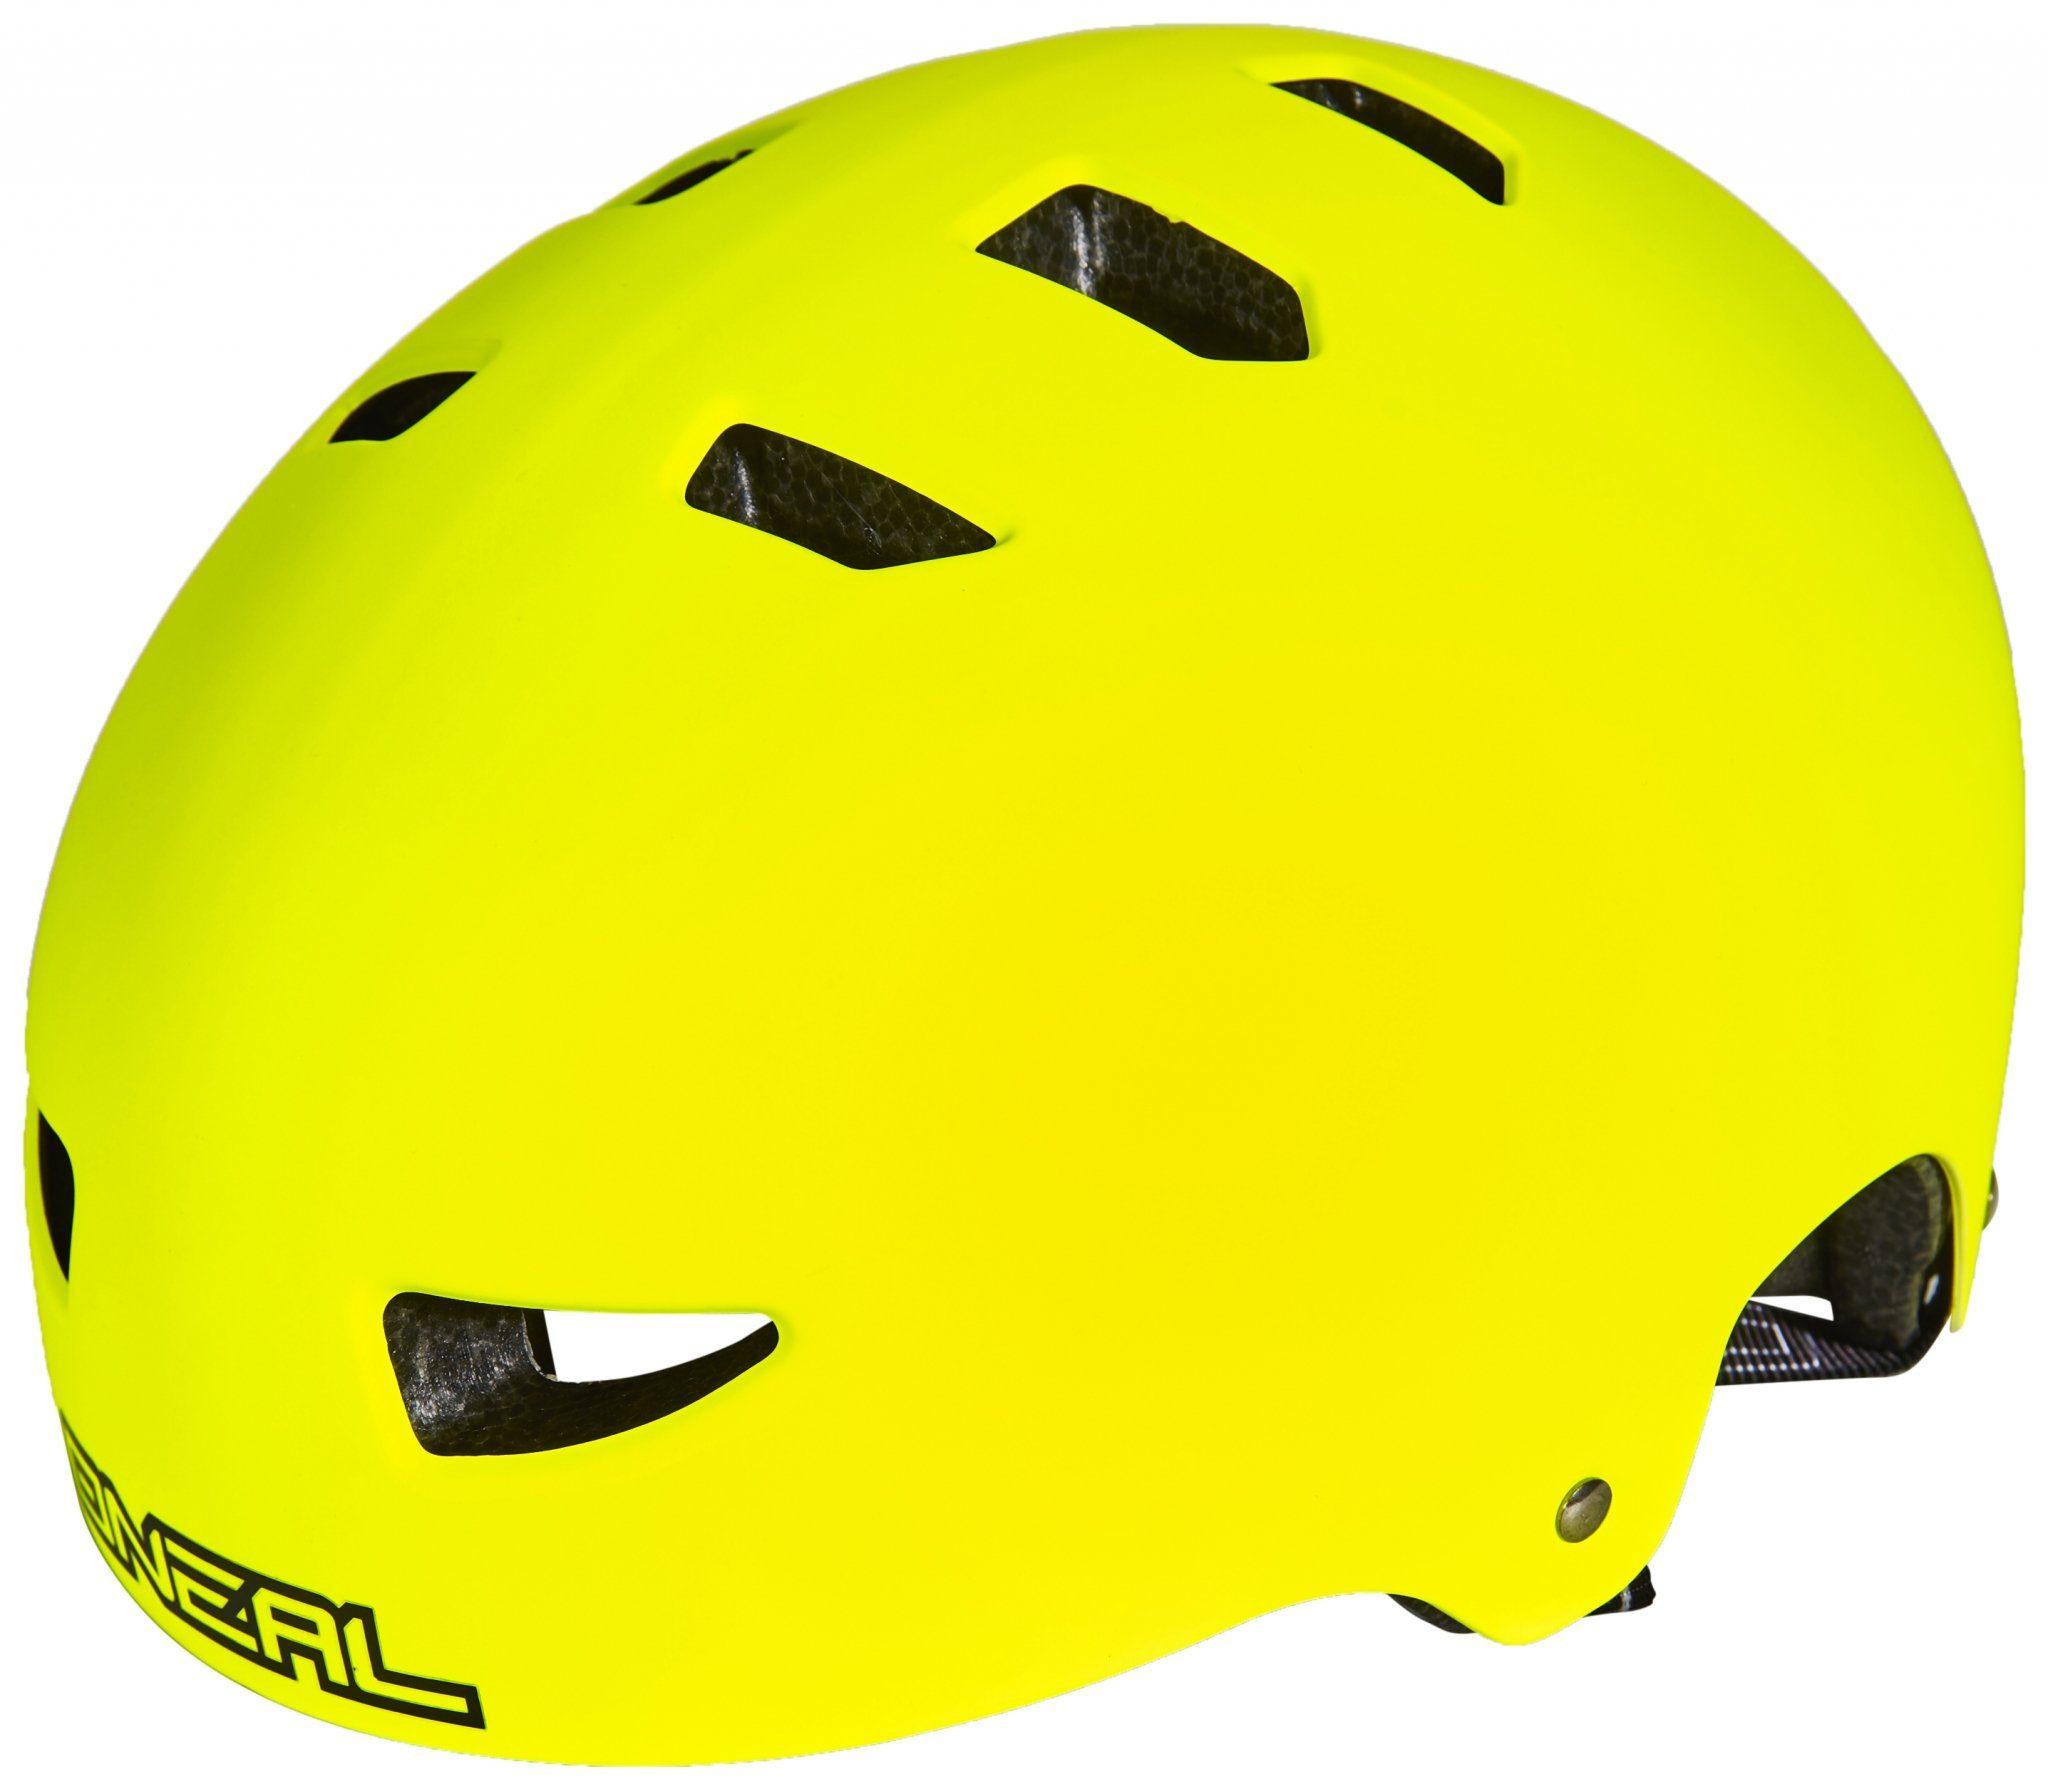 O'NEAL Fahrradhelm »Dirt Lid Fidlock ProFit Helmet«